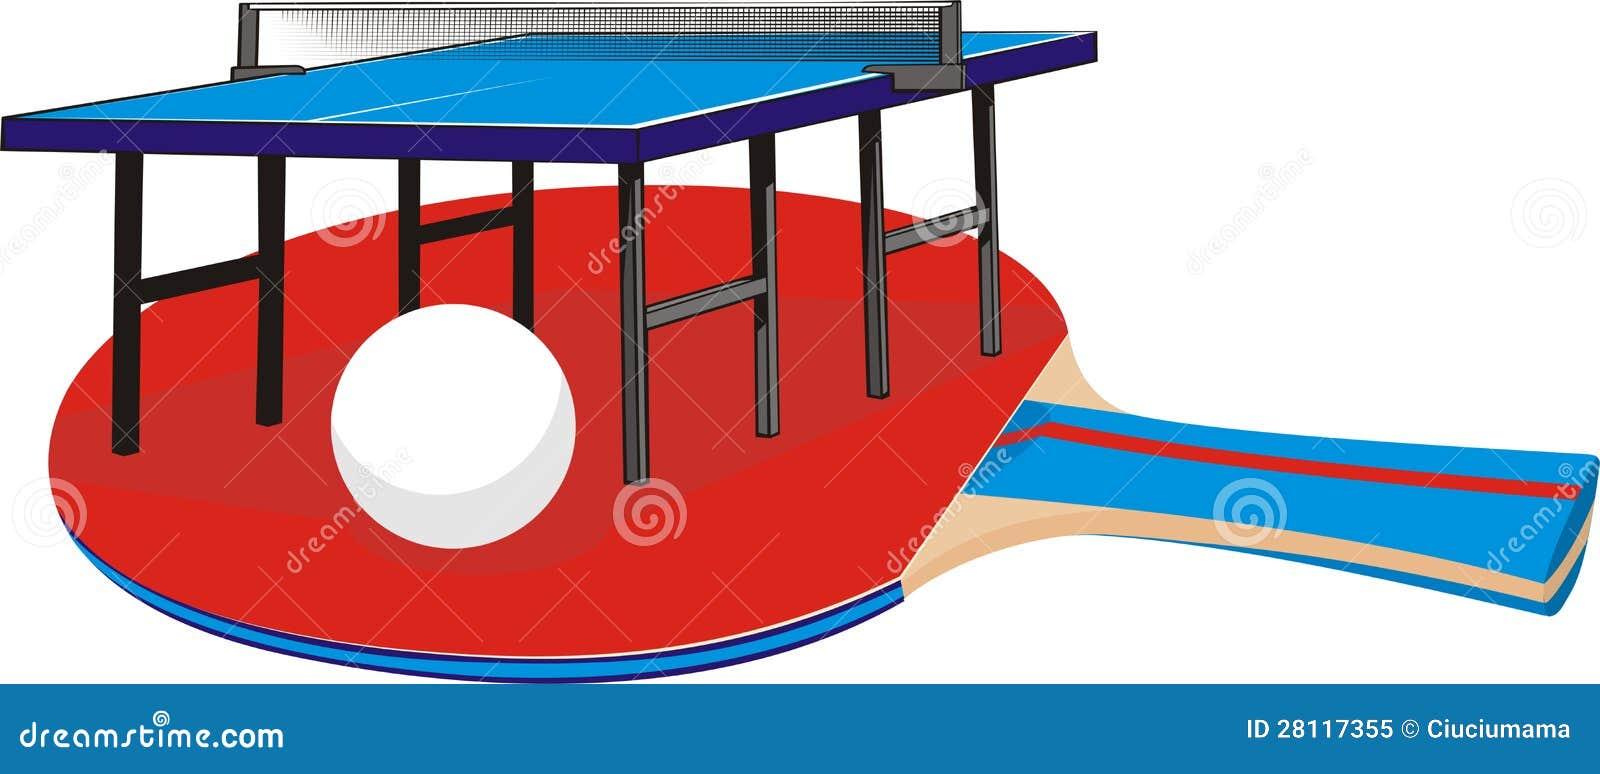 Table Tennis Equipment Stock Vector Illustration Of